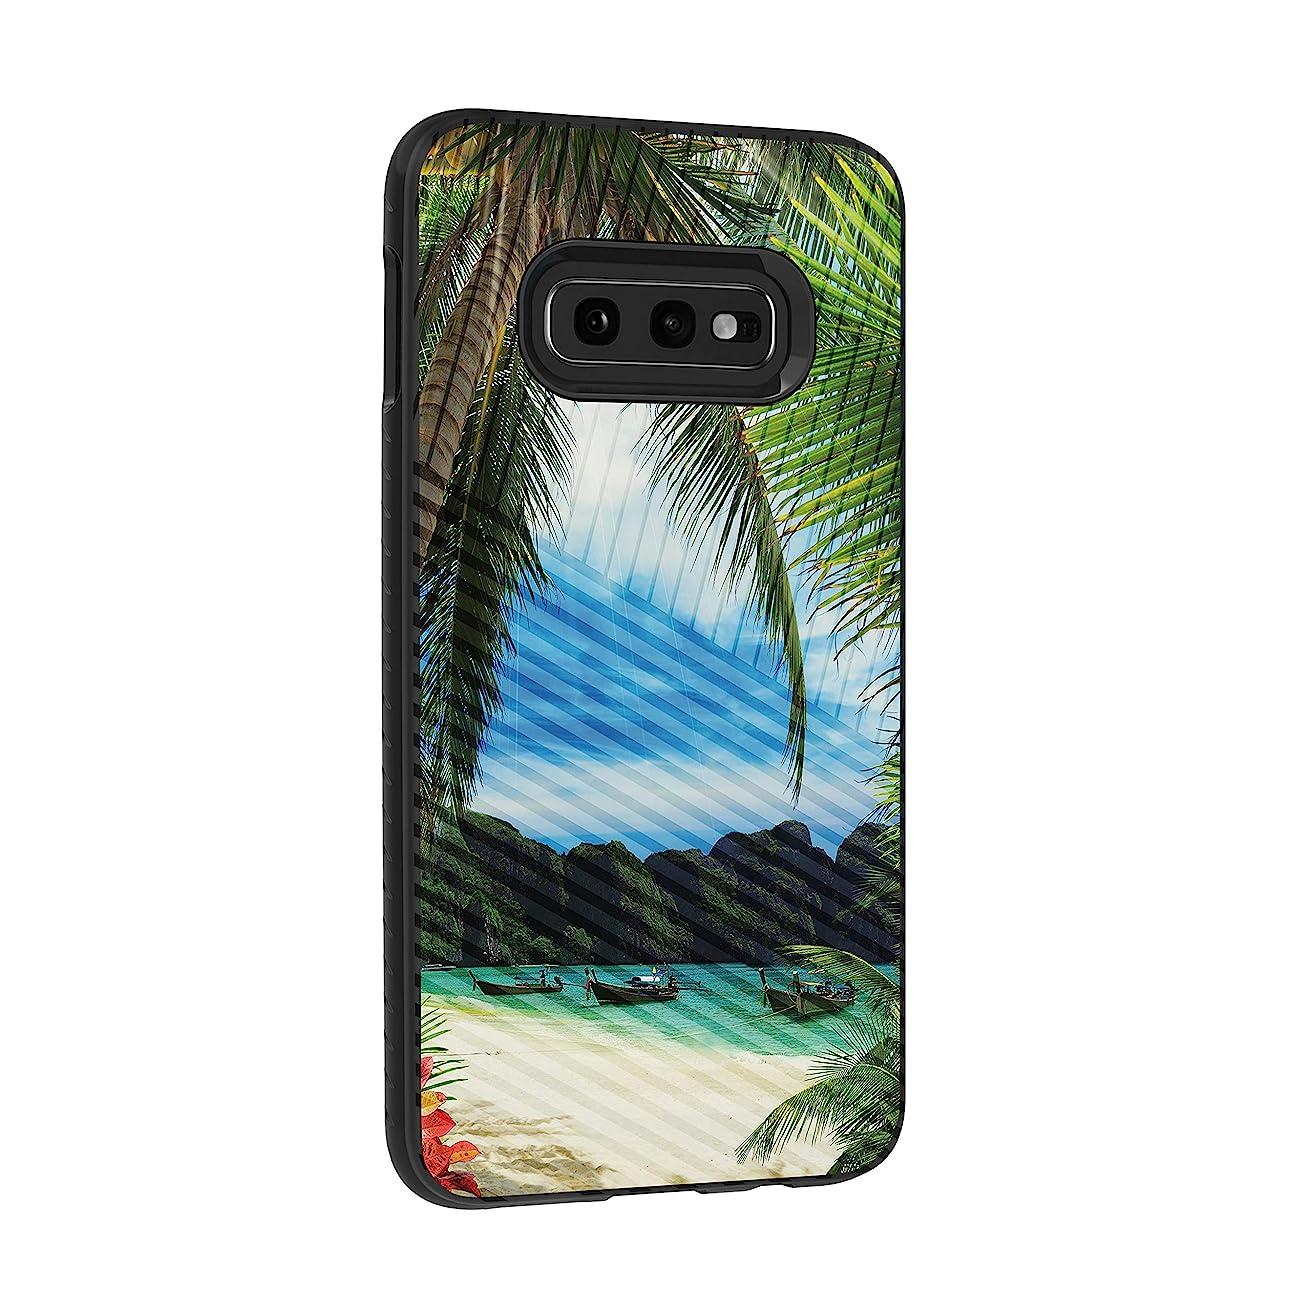 TurtleArmor   Compatible for Samsung Galaxy S10e Case   S10 Lite Case   G970   Hard Shell Impact TPU Case Hybrid Engraved Grooves Ocean Beach Design - Tropical Beach